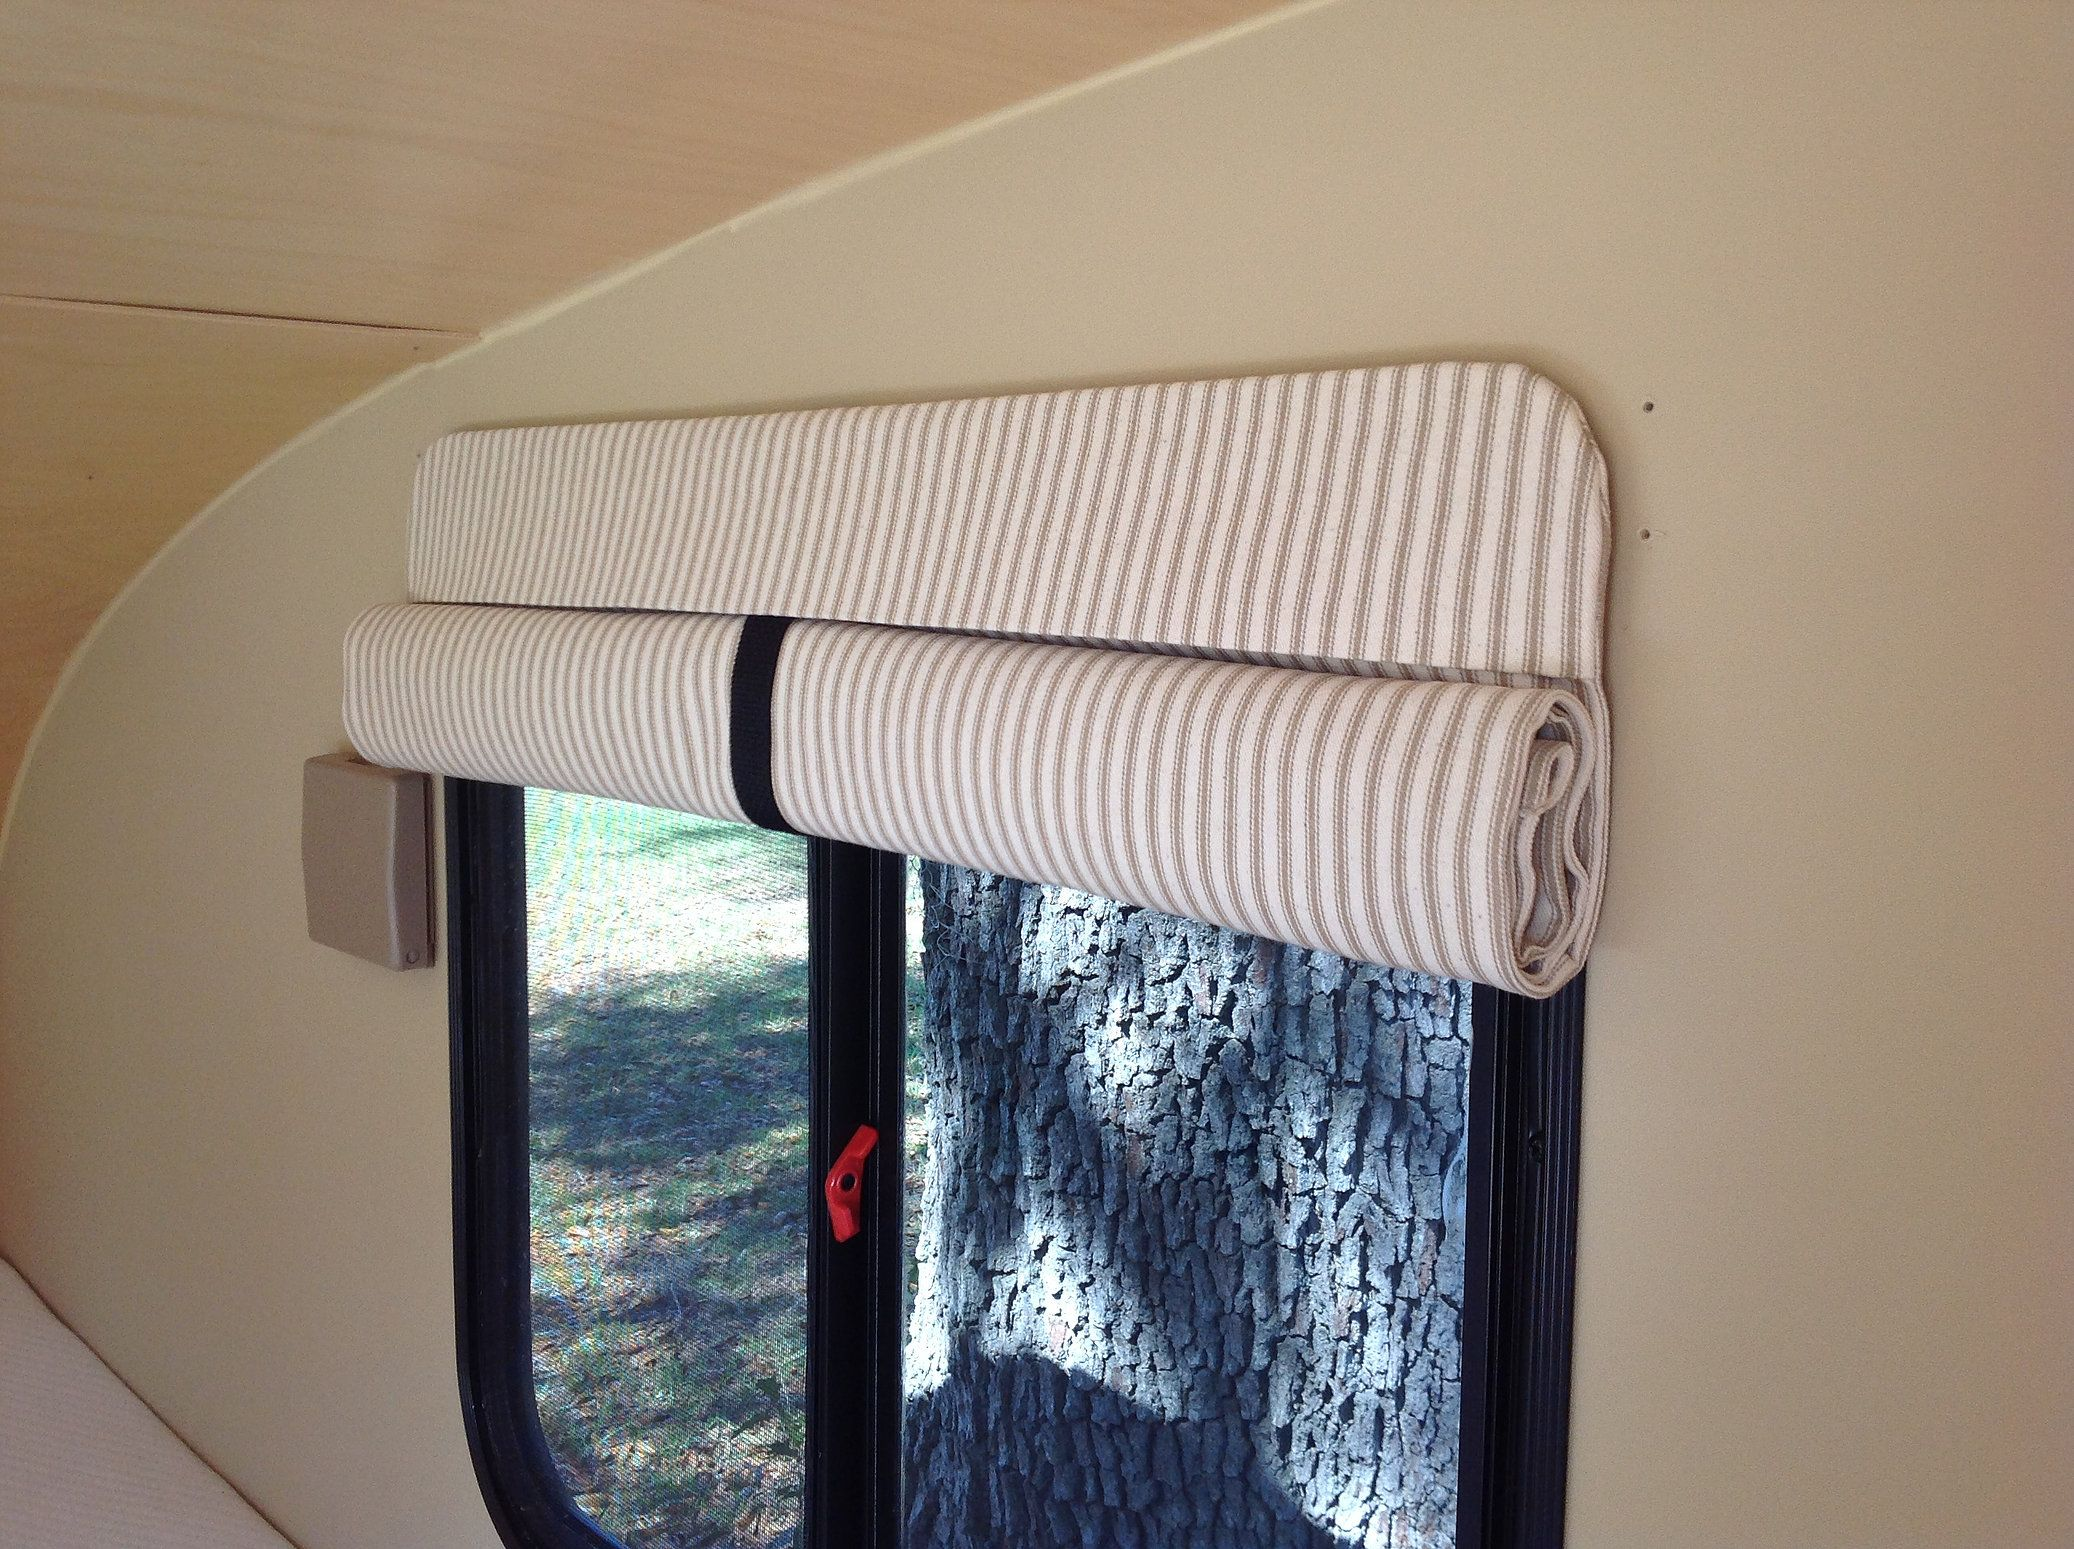 Insulated camper window shade 22 to 37 widepremium